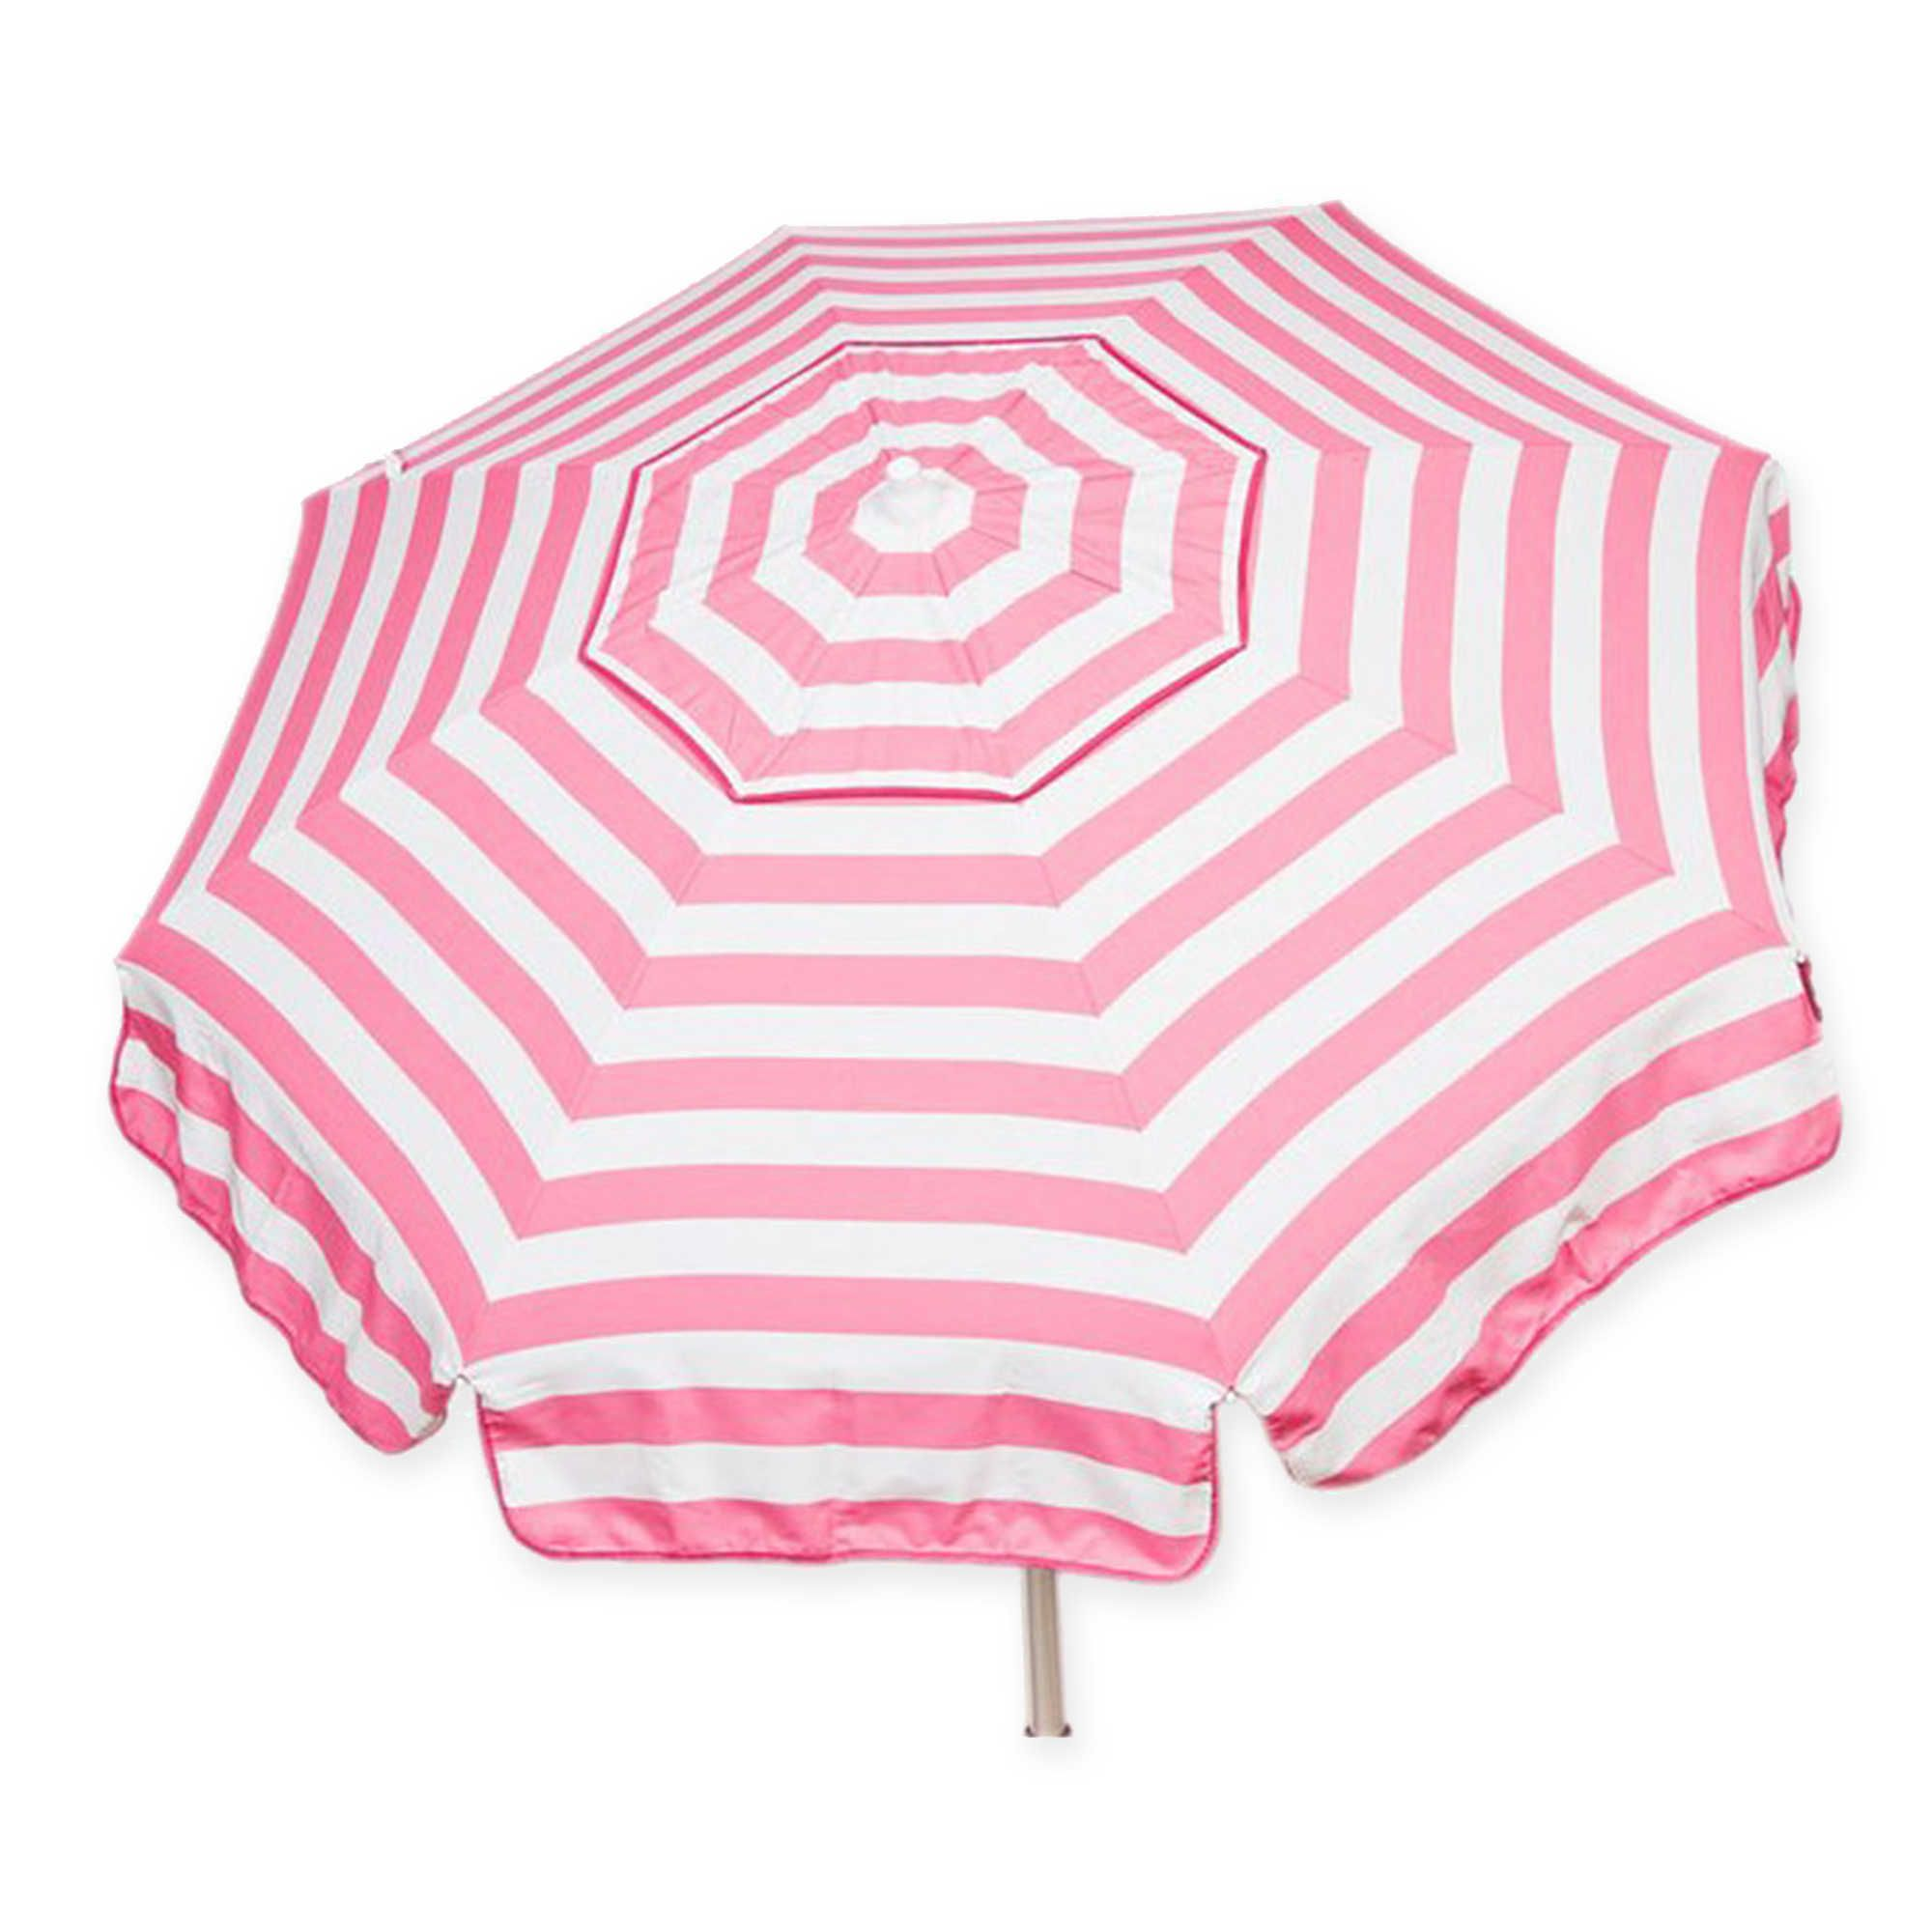 foot round italian patio umbrella in pinkwhite  bushes  - foot round italian patio umbrella in pinkwhite